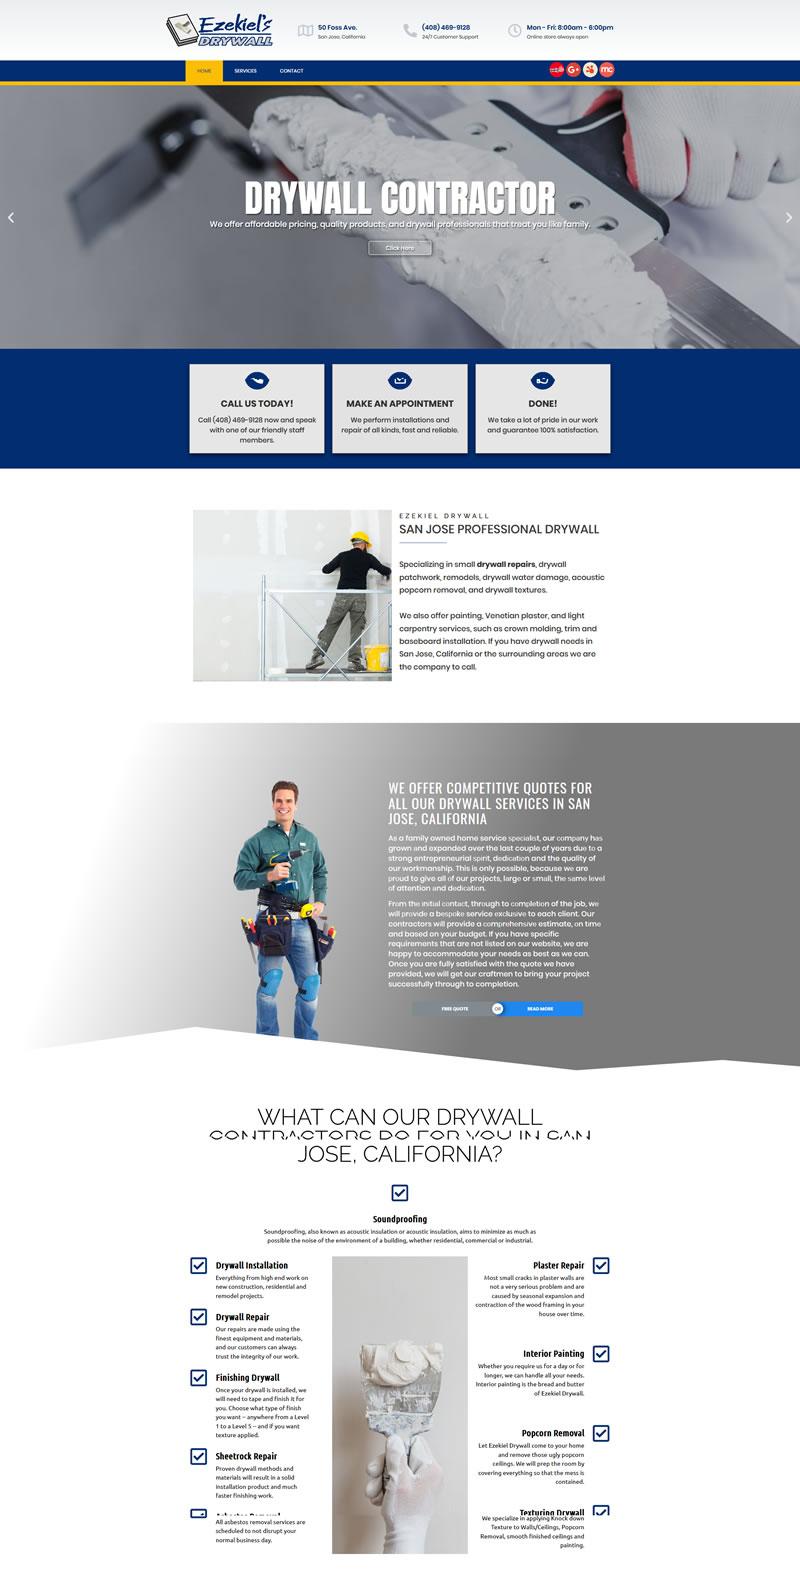 Home Ezekiel Drywall Services Free Estimate 408 469 9128